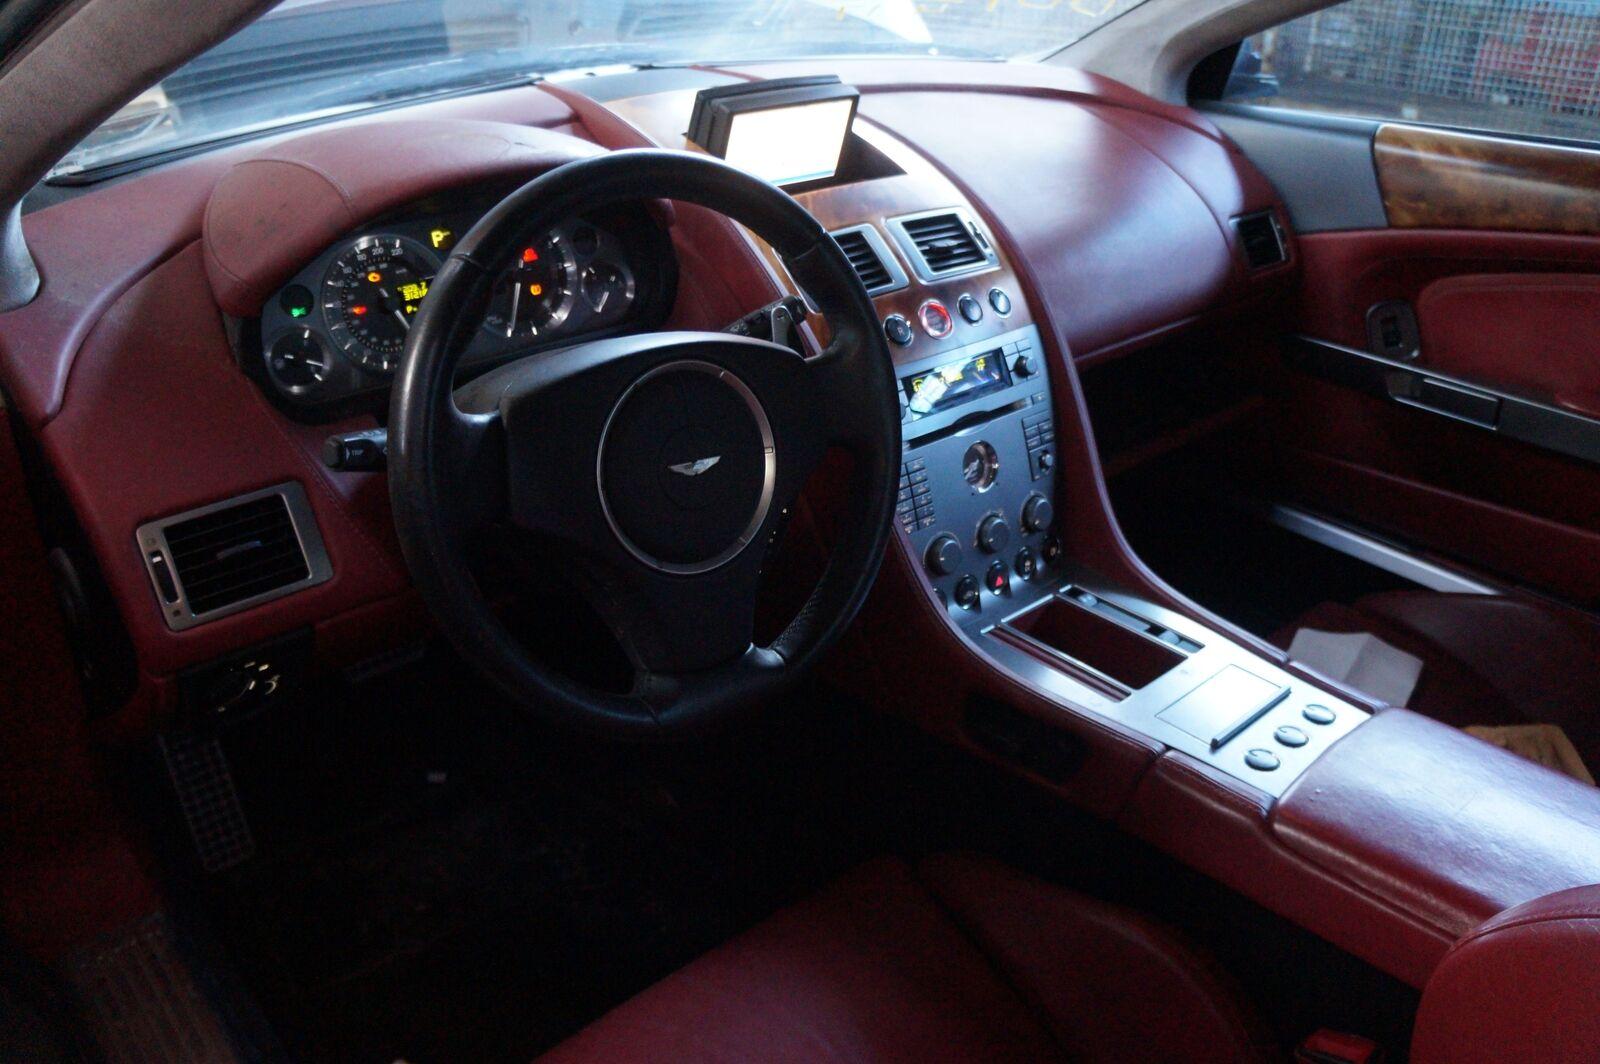 Cabin Distribution Fuse Box Body Control Modul 4G43 14C272 AH Aston Martin DB9 283020802329 7?fit=1600%2C1064&ssl=1 cabin distribution fuse box body control modul 4g43 14c272 ah aston